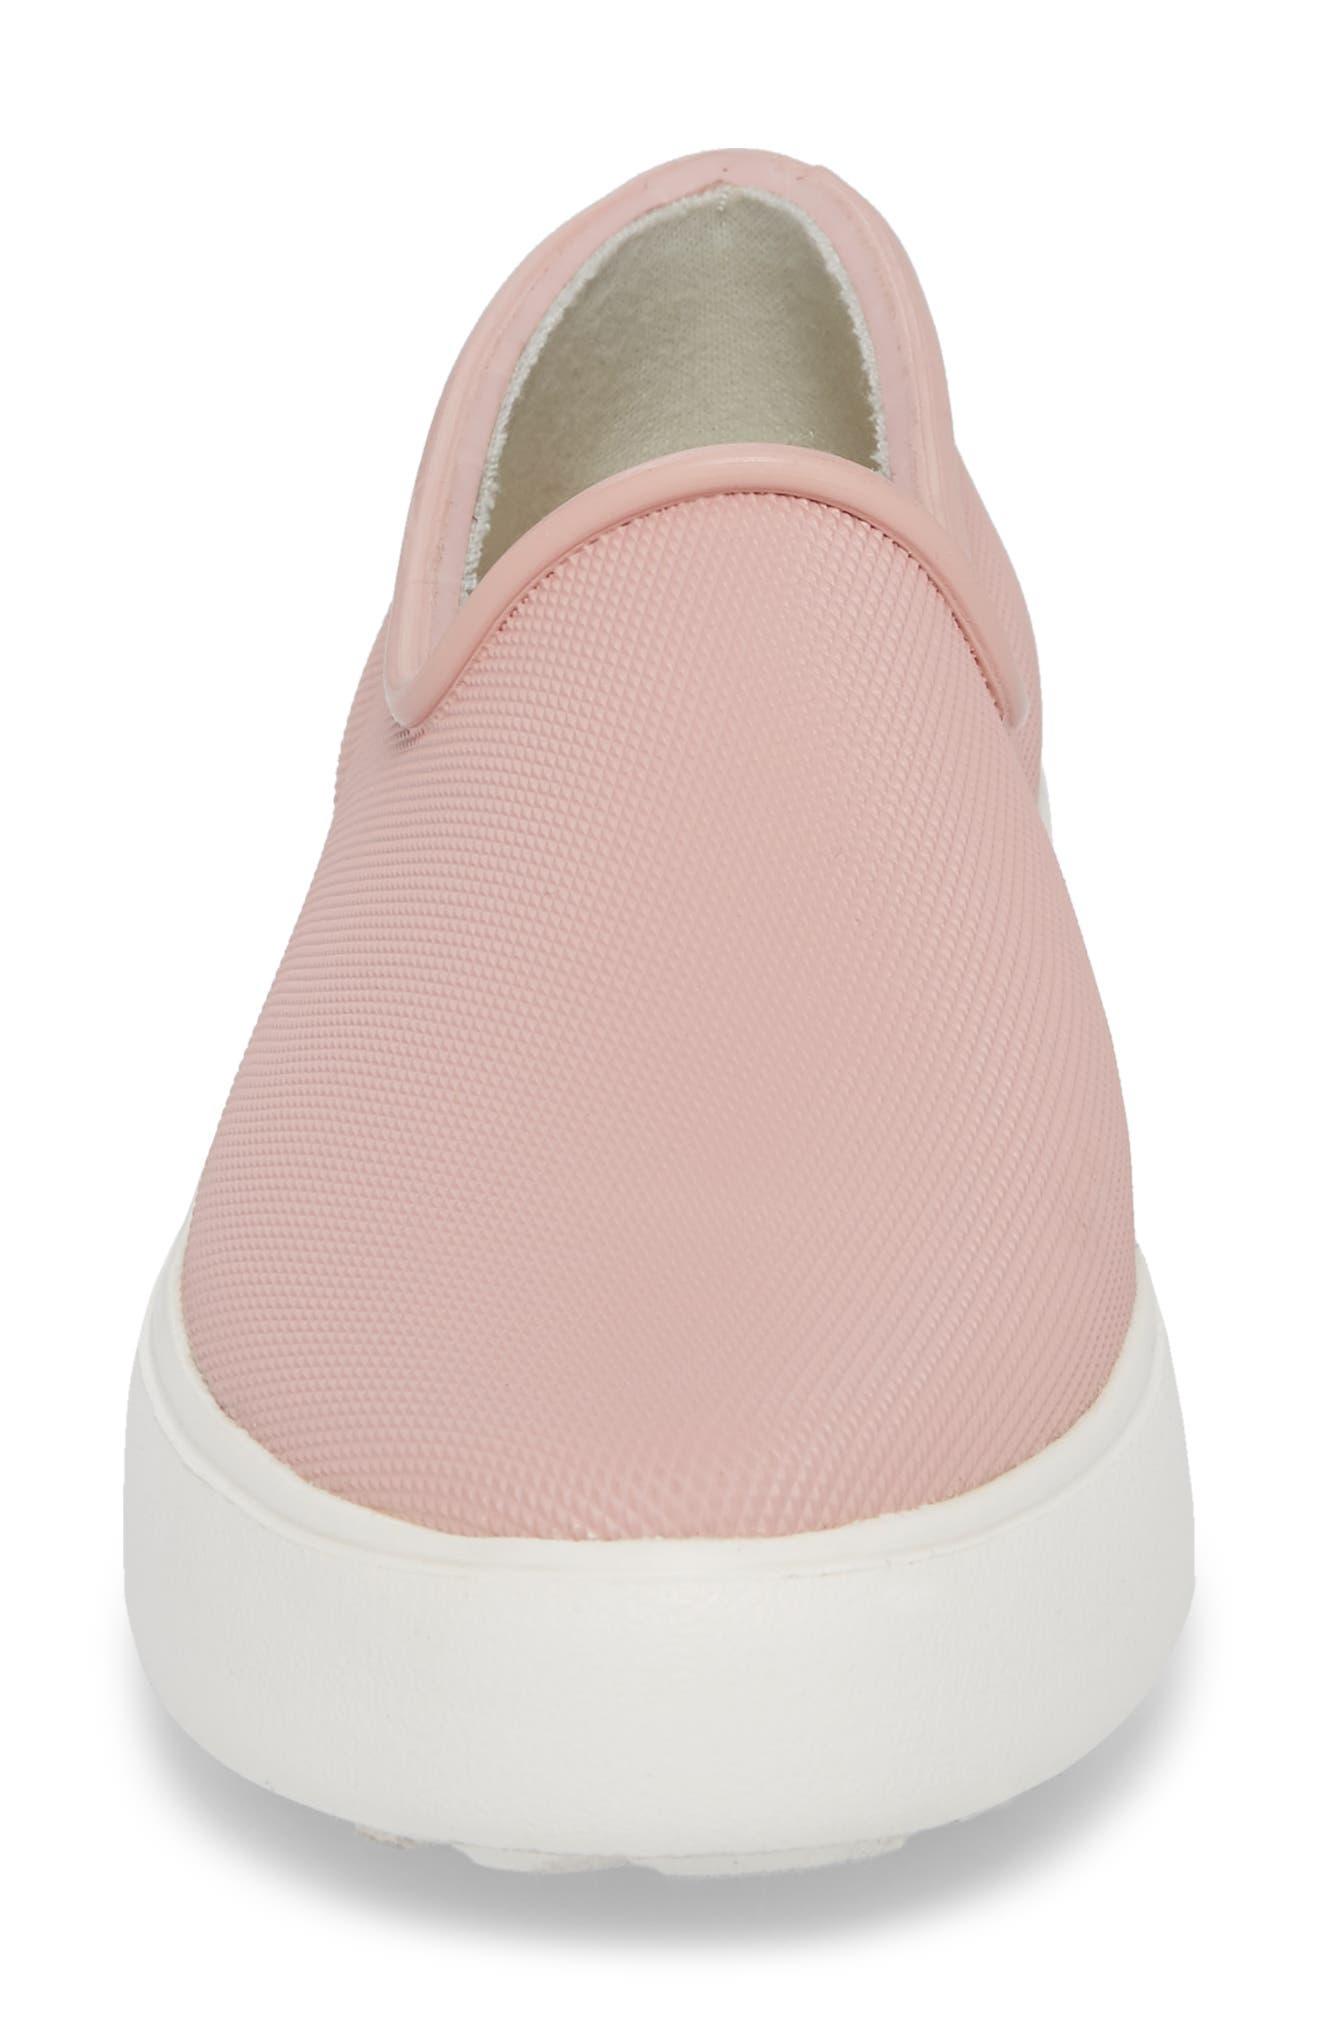 Rainy Day Waterproof Slip-On Sneaker,                             Alternate thumbnail 4, color,                             Dusty Pink